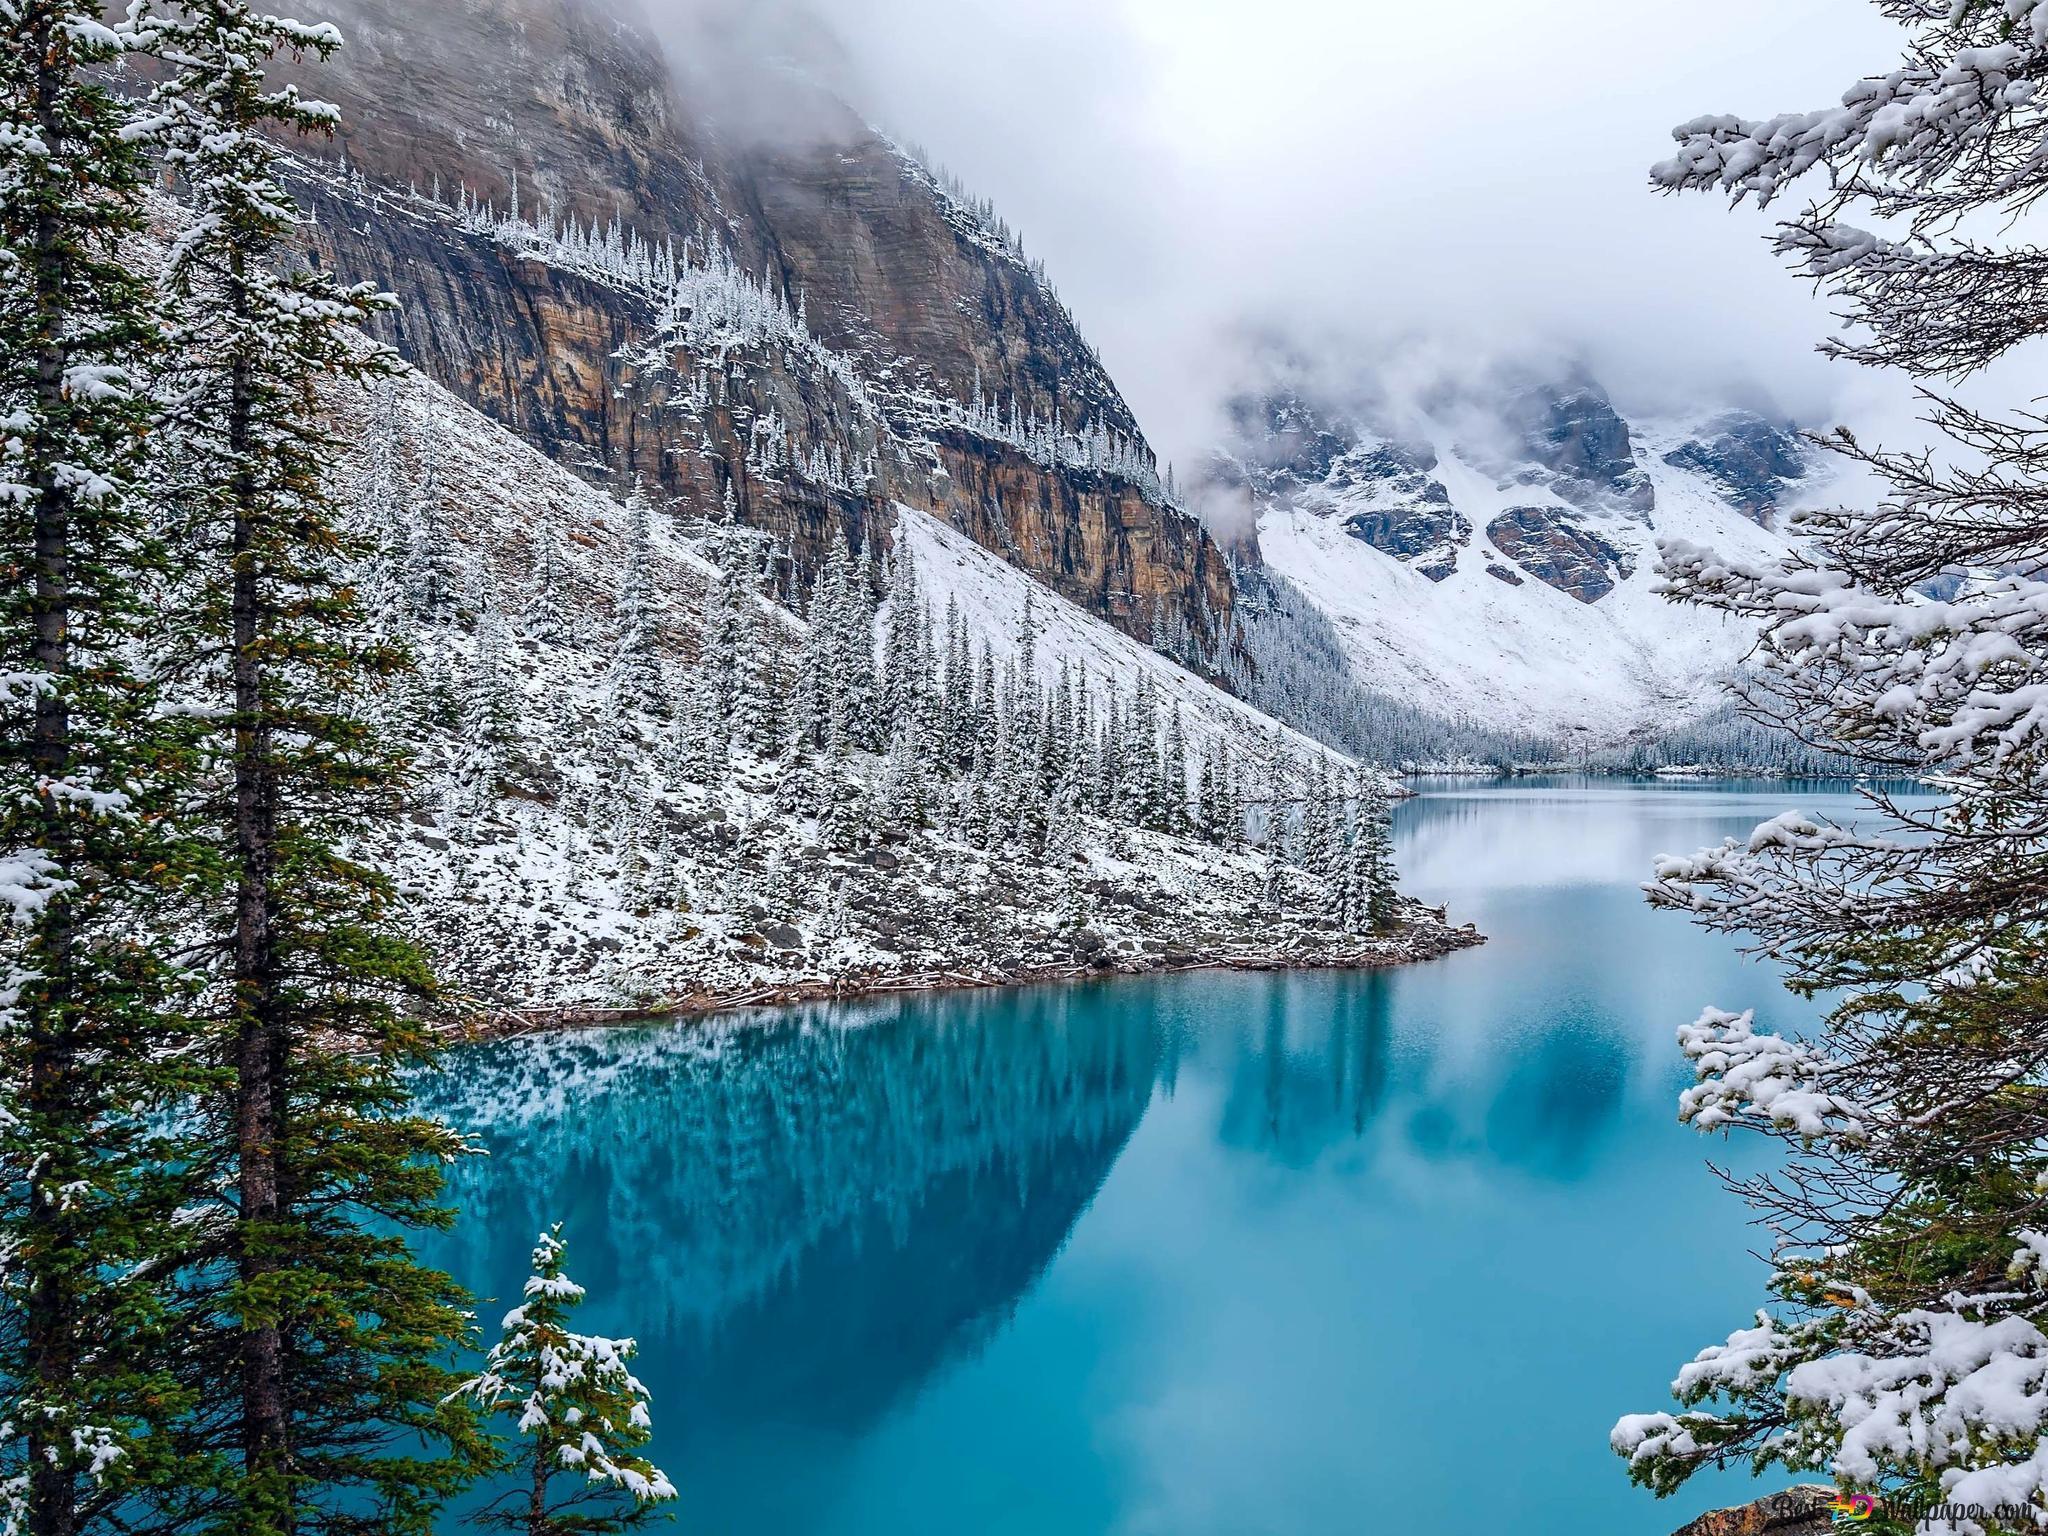 Banff National Park Moraine Lake Hd Wallpaper Download